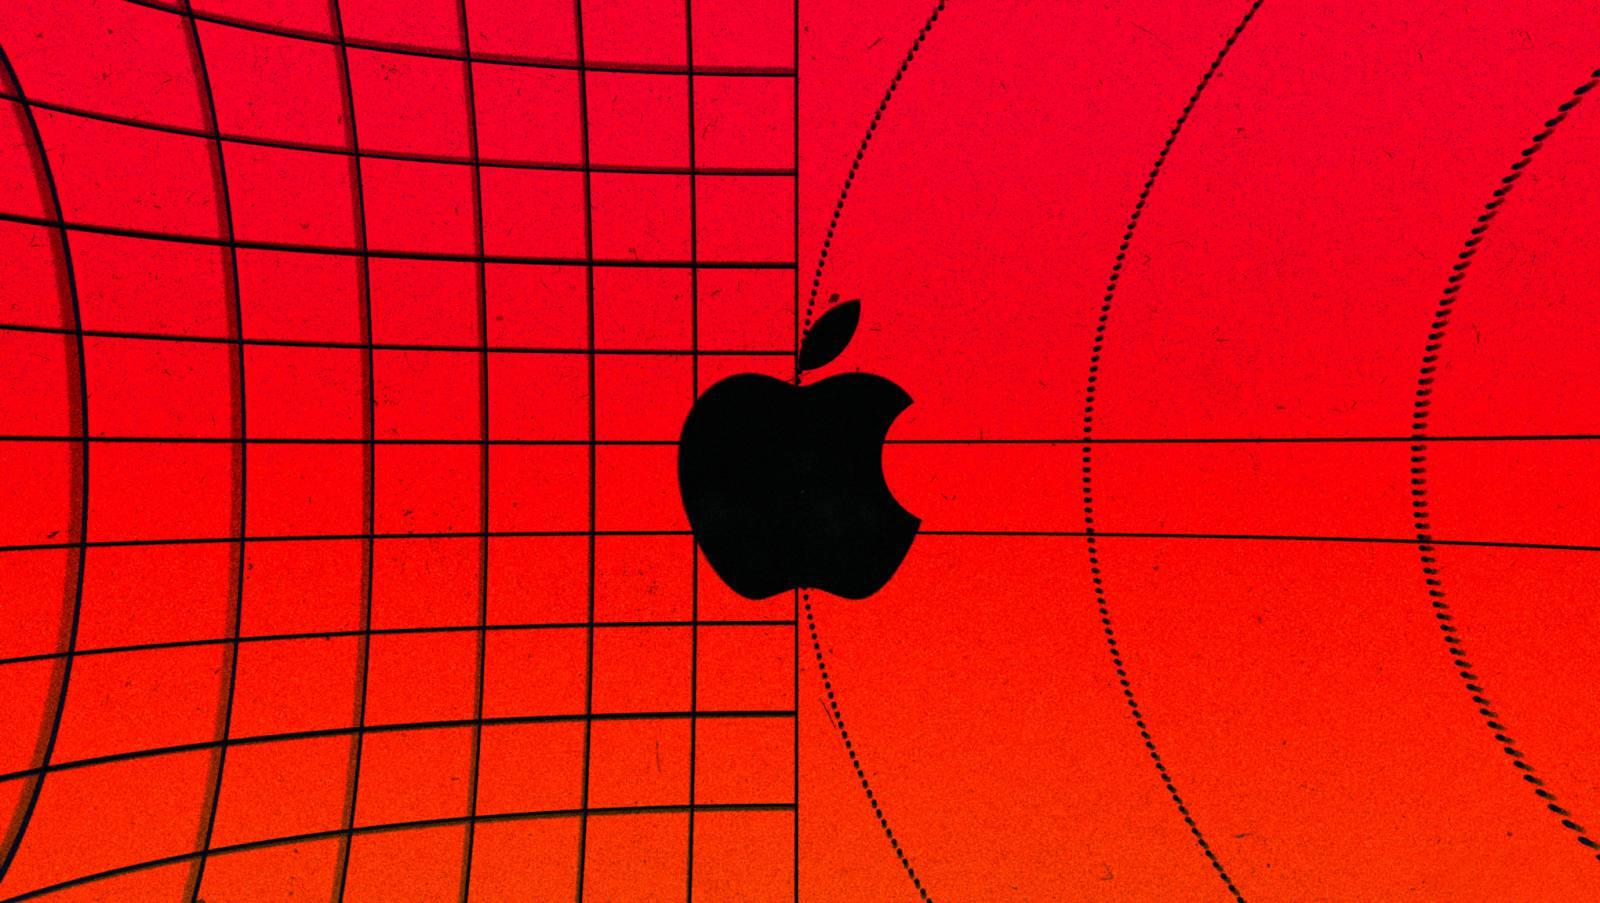 apple produse lux